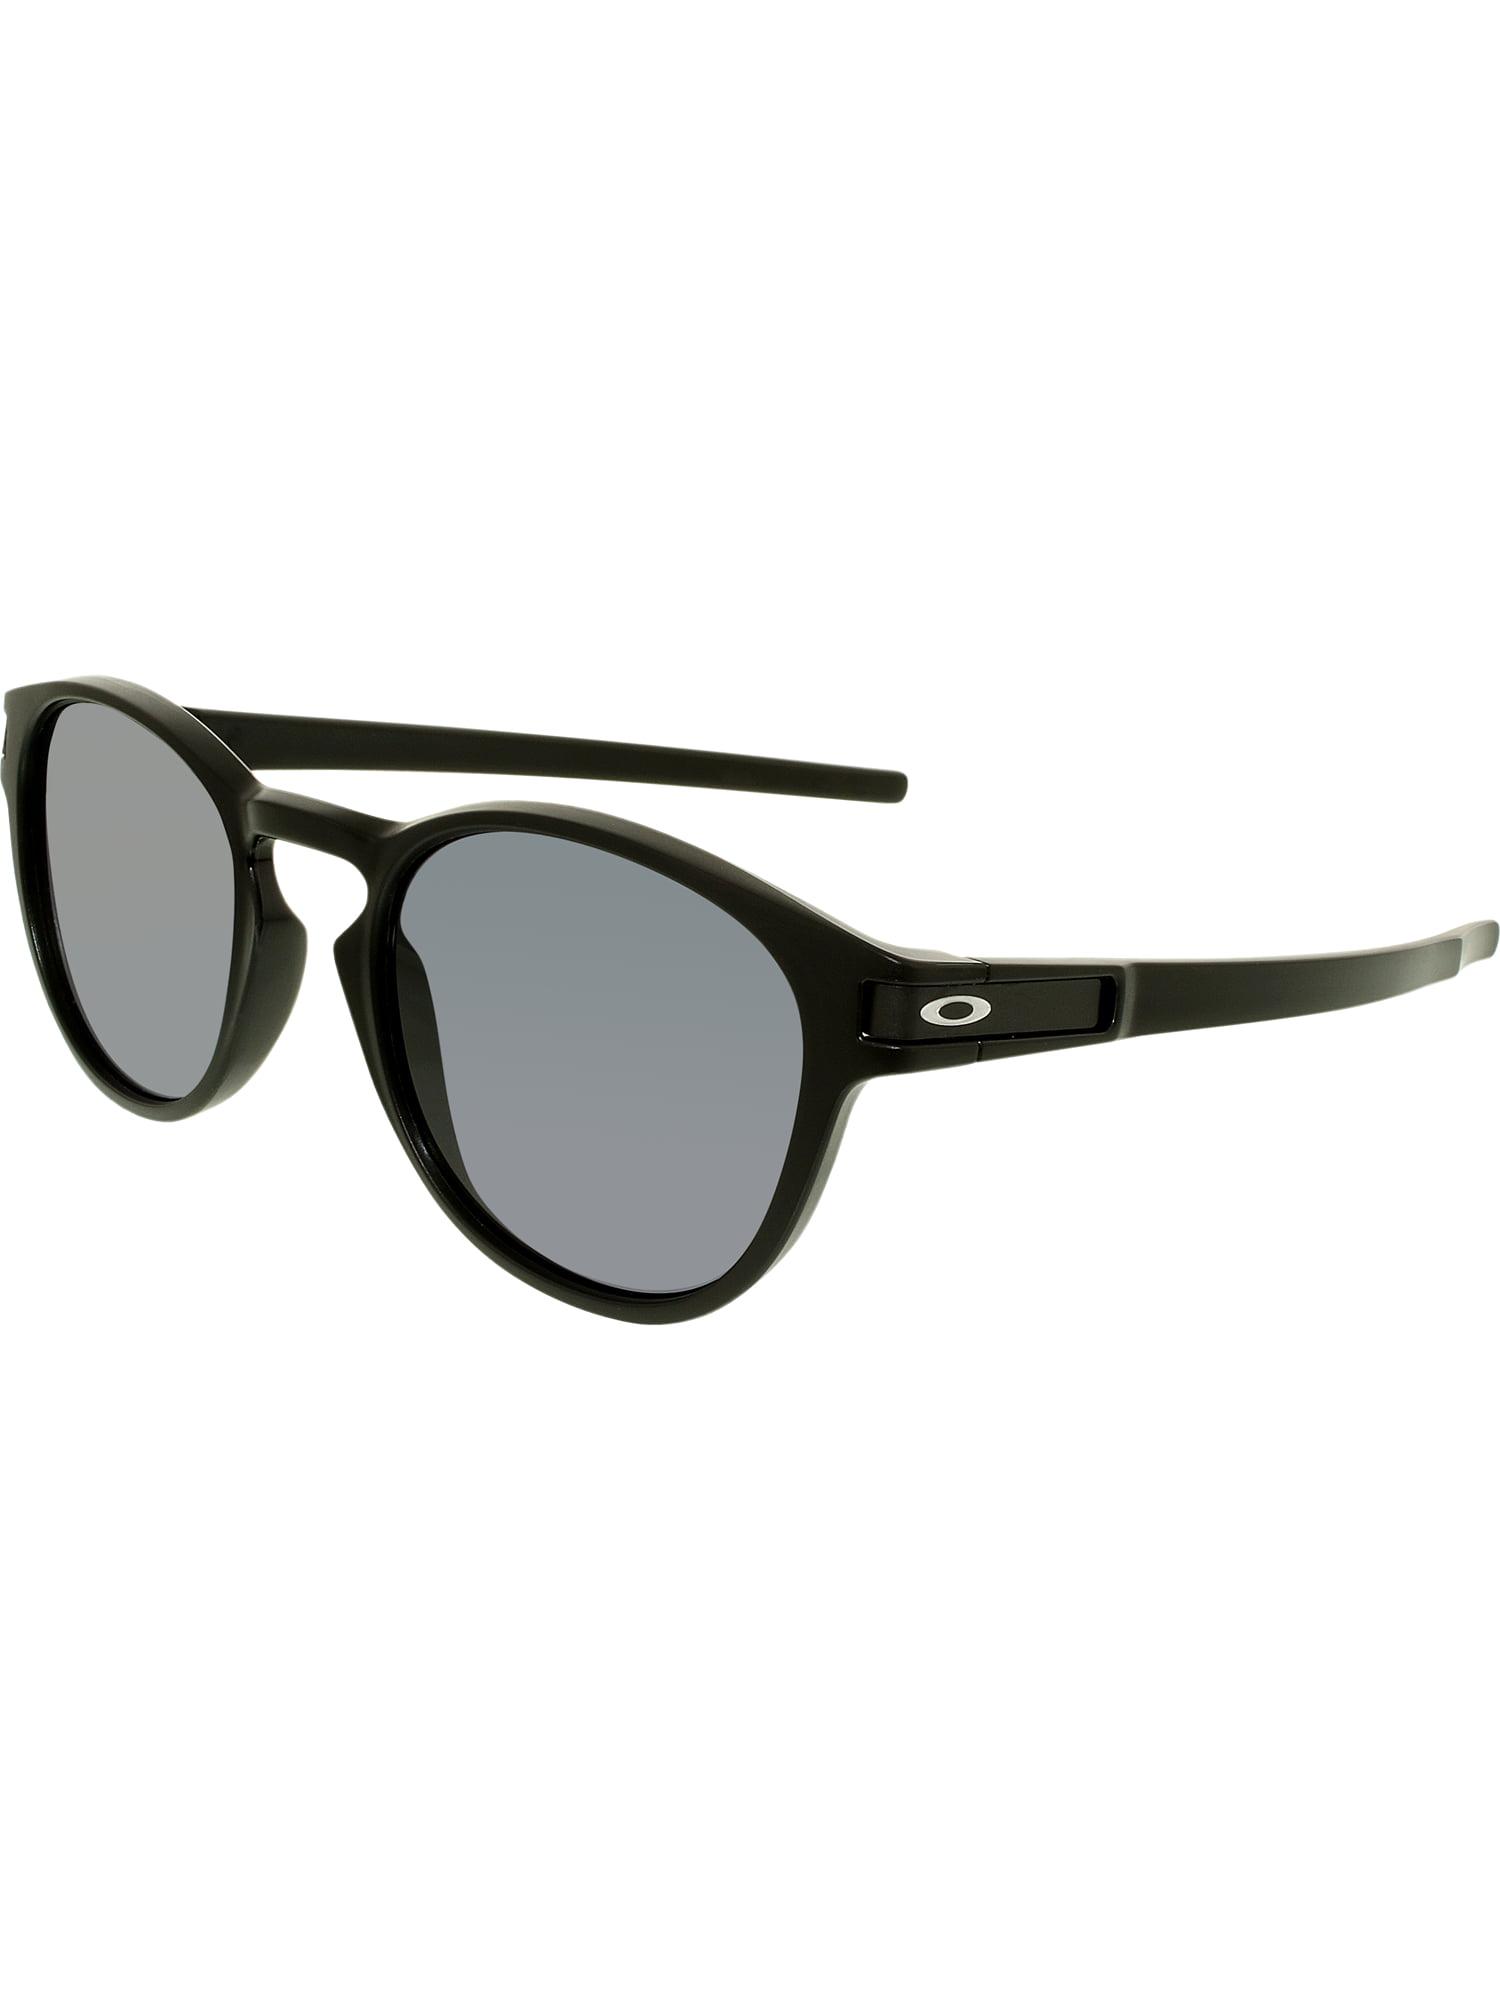 9700c7f8594 Oakley Men s Latch OO9265-01 Black Round Sunglasses